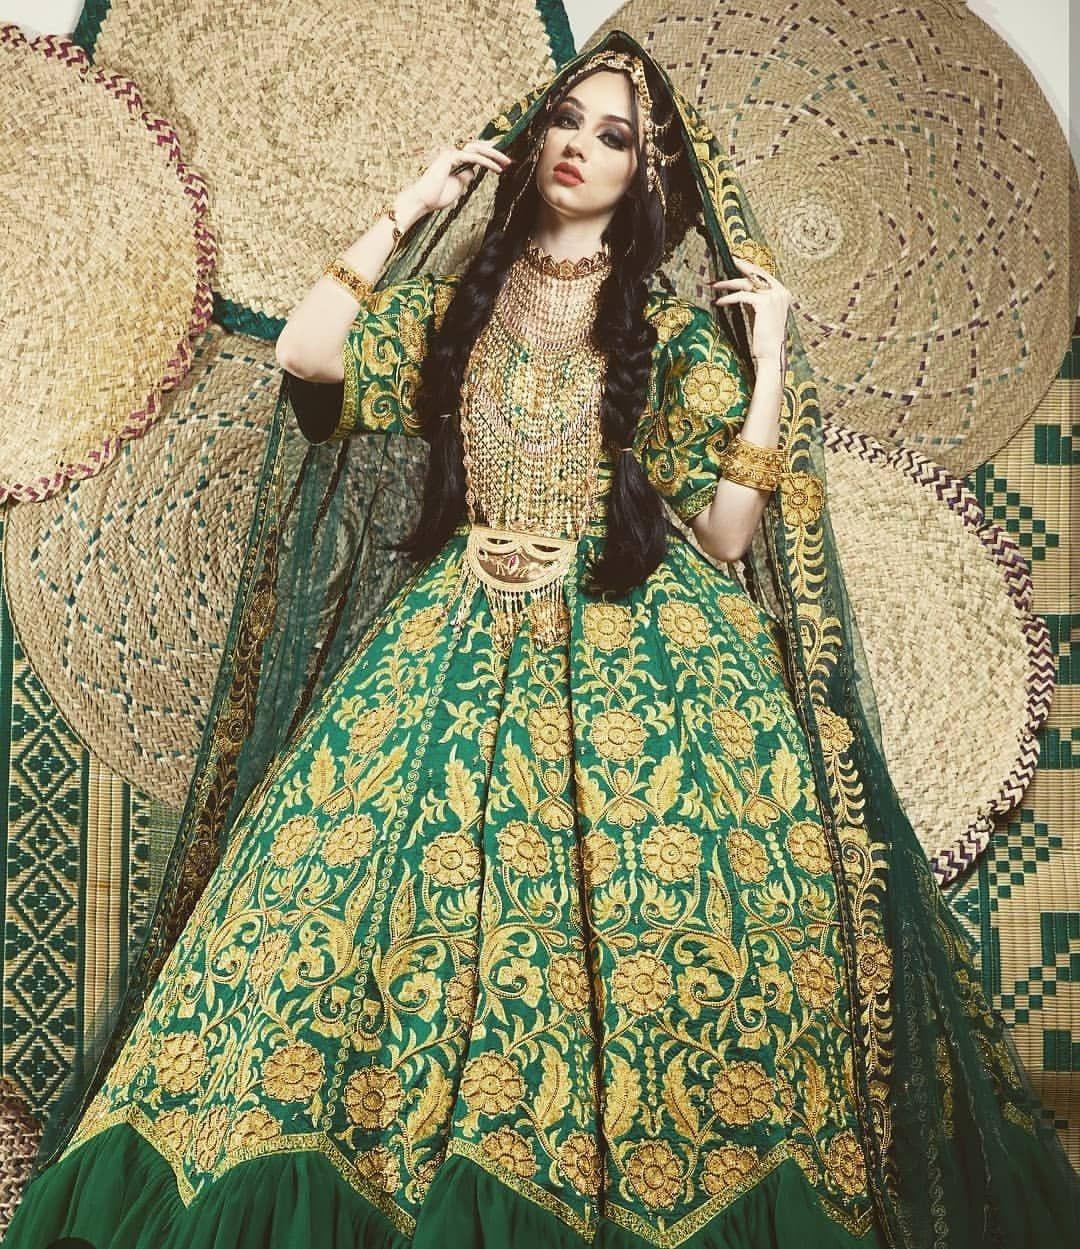 19 Likes 0 Comments بوتيك شمسه المهيري Shamsaalmehairi5 On Instagram فساتين ليله حنا لايوجد ايجار ابدا تابعوا Traditional Dresses Beauty Dress Fashion